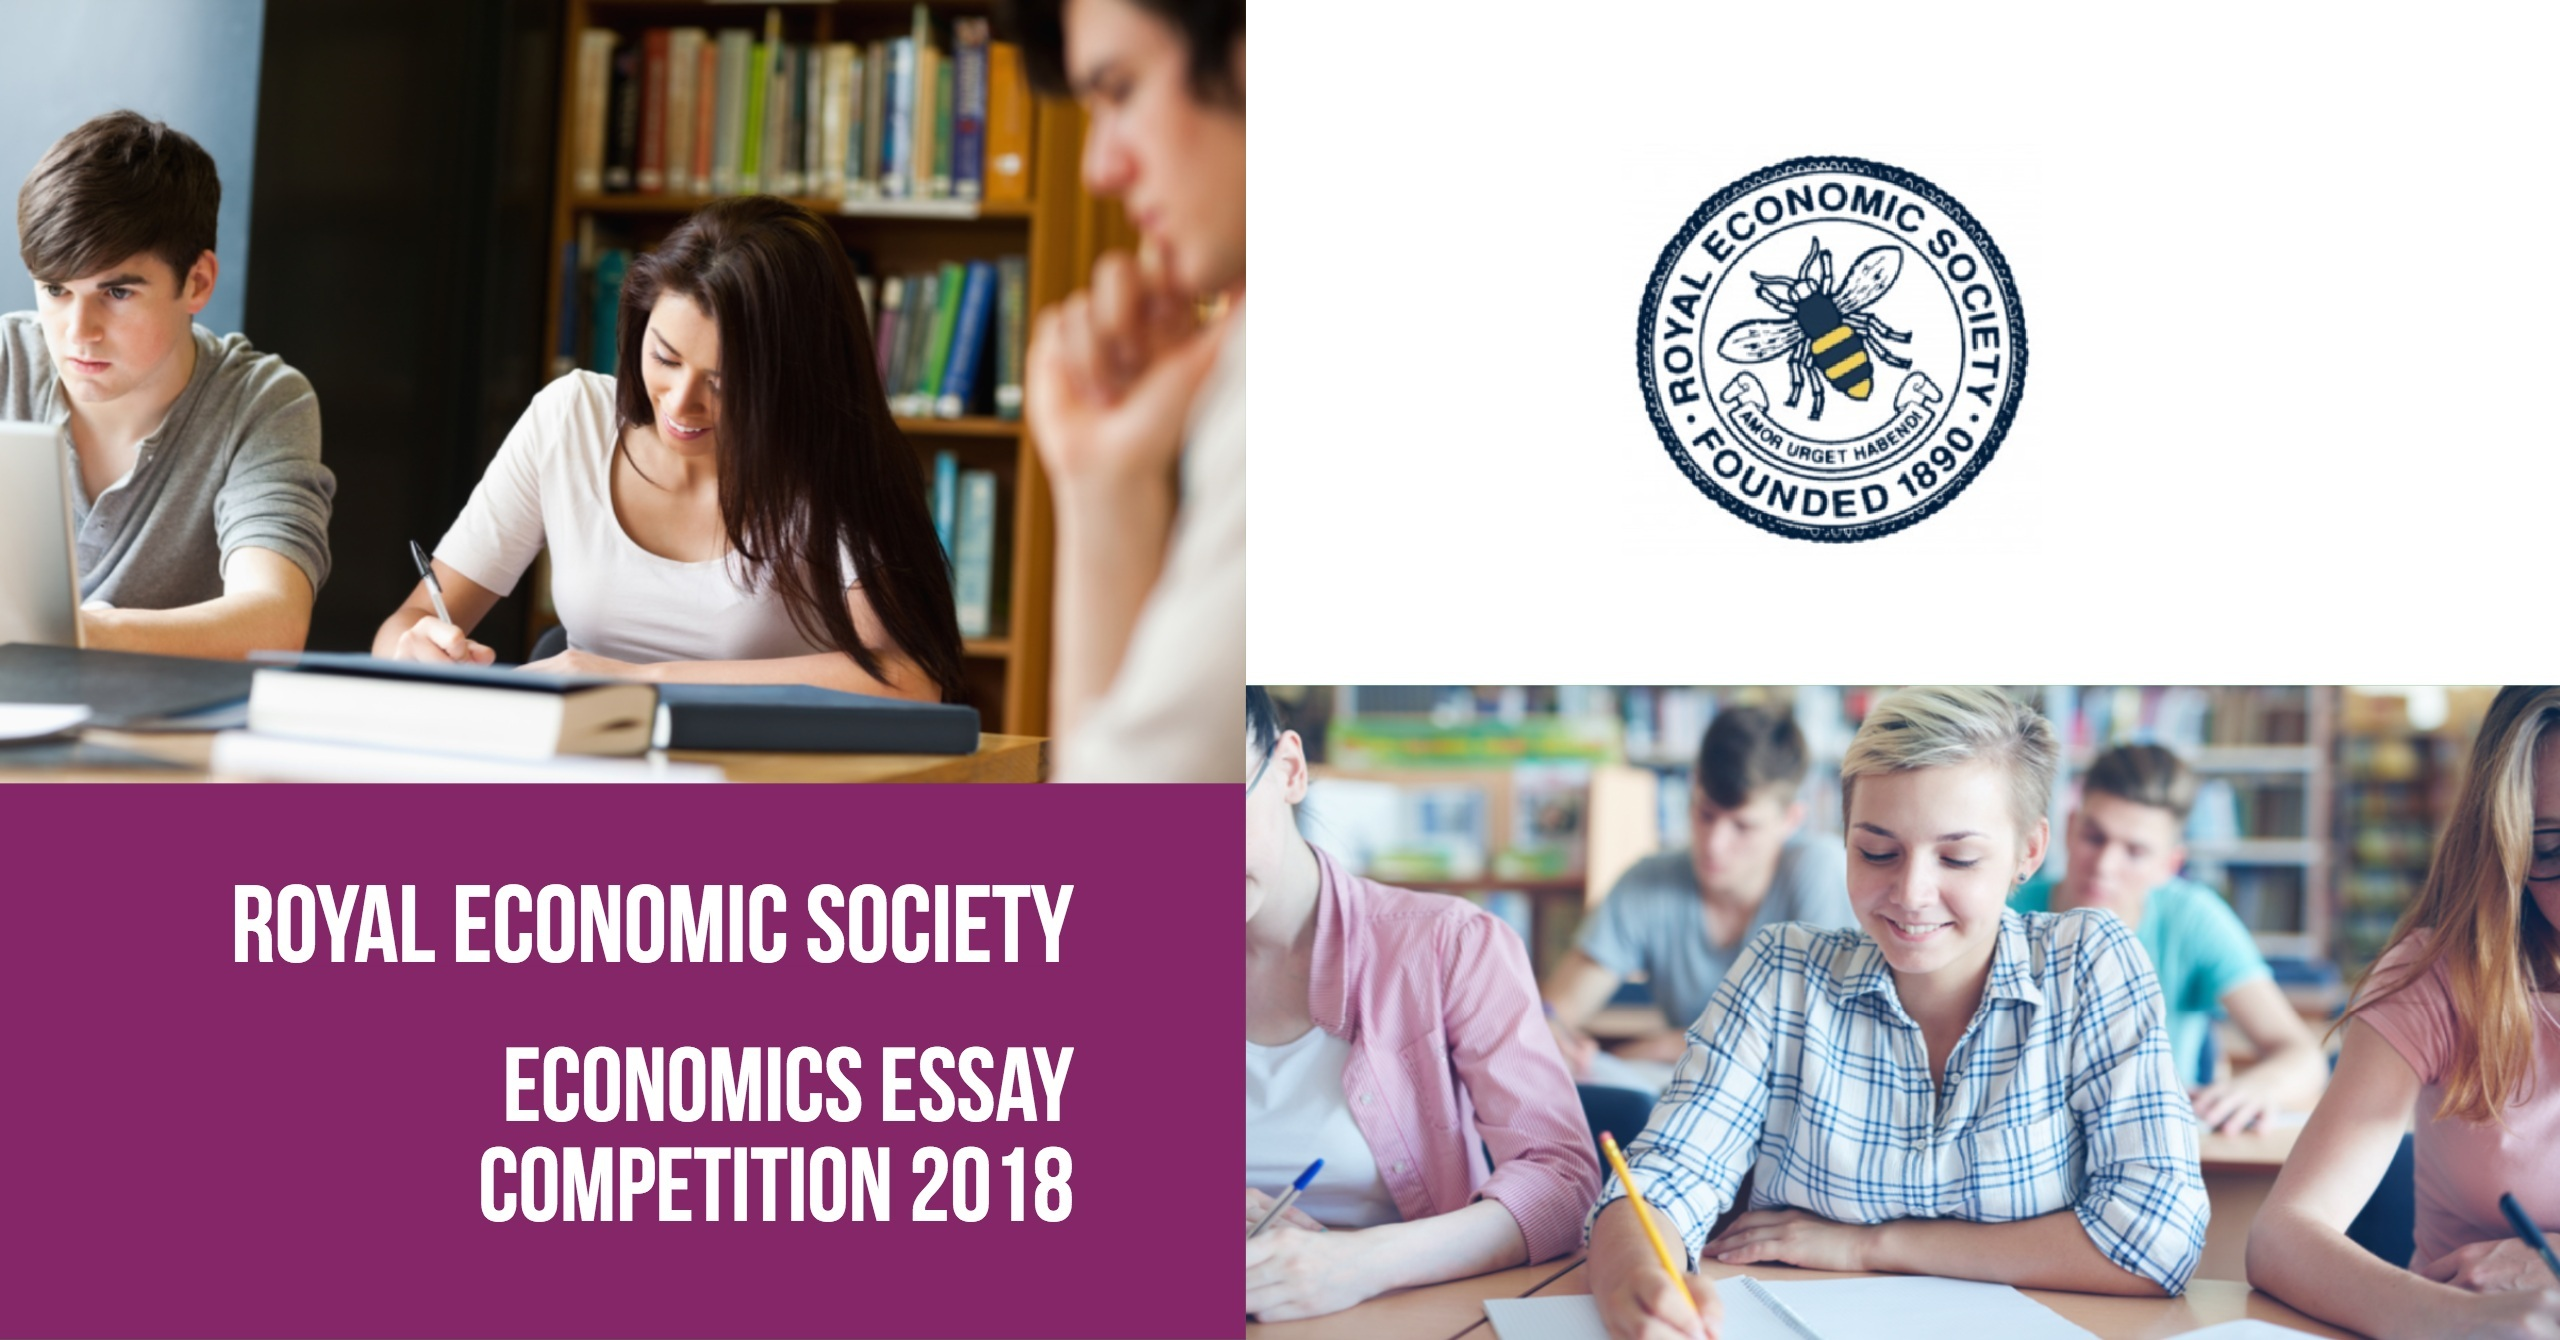 Tips for writing economics essays